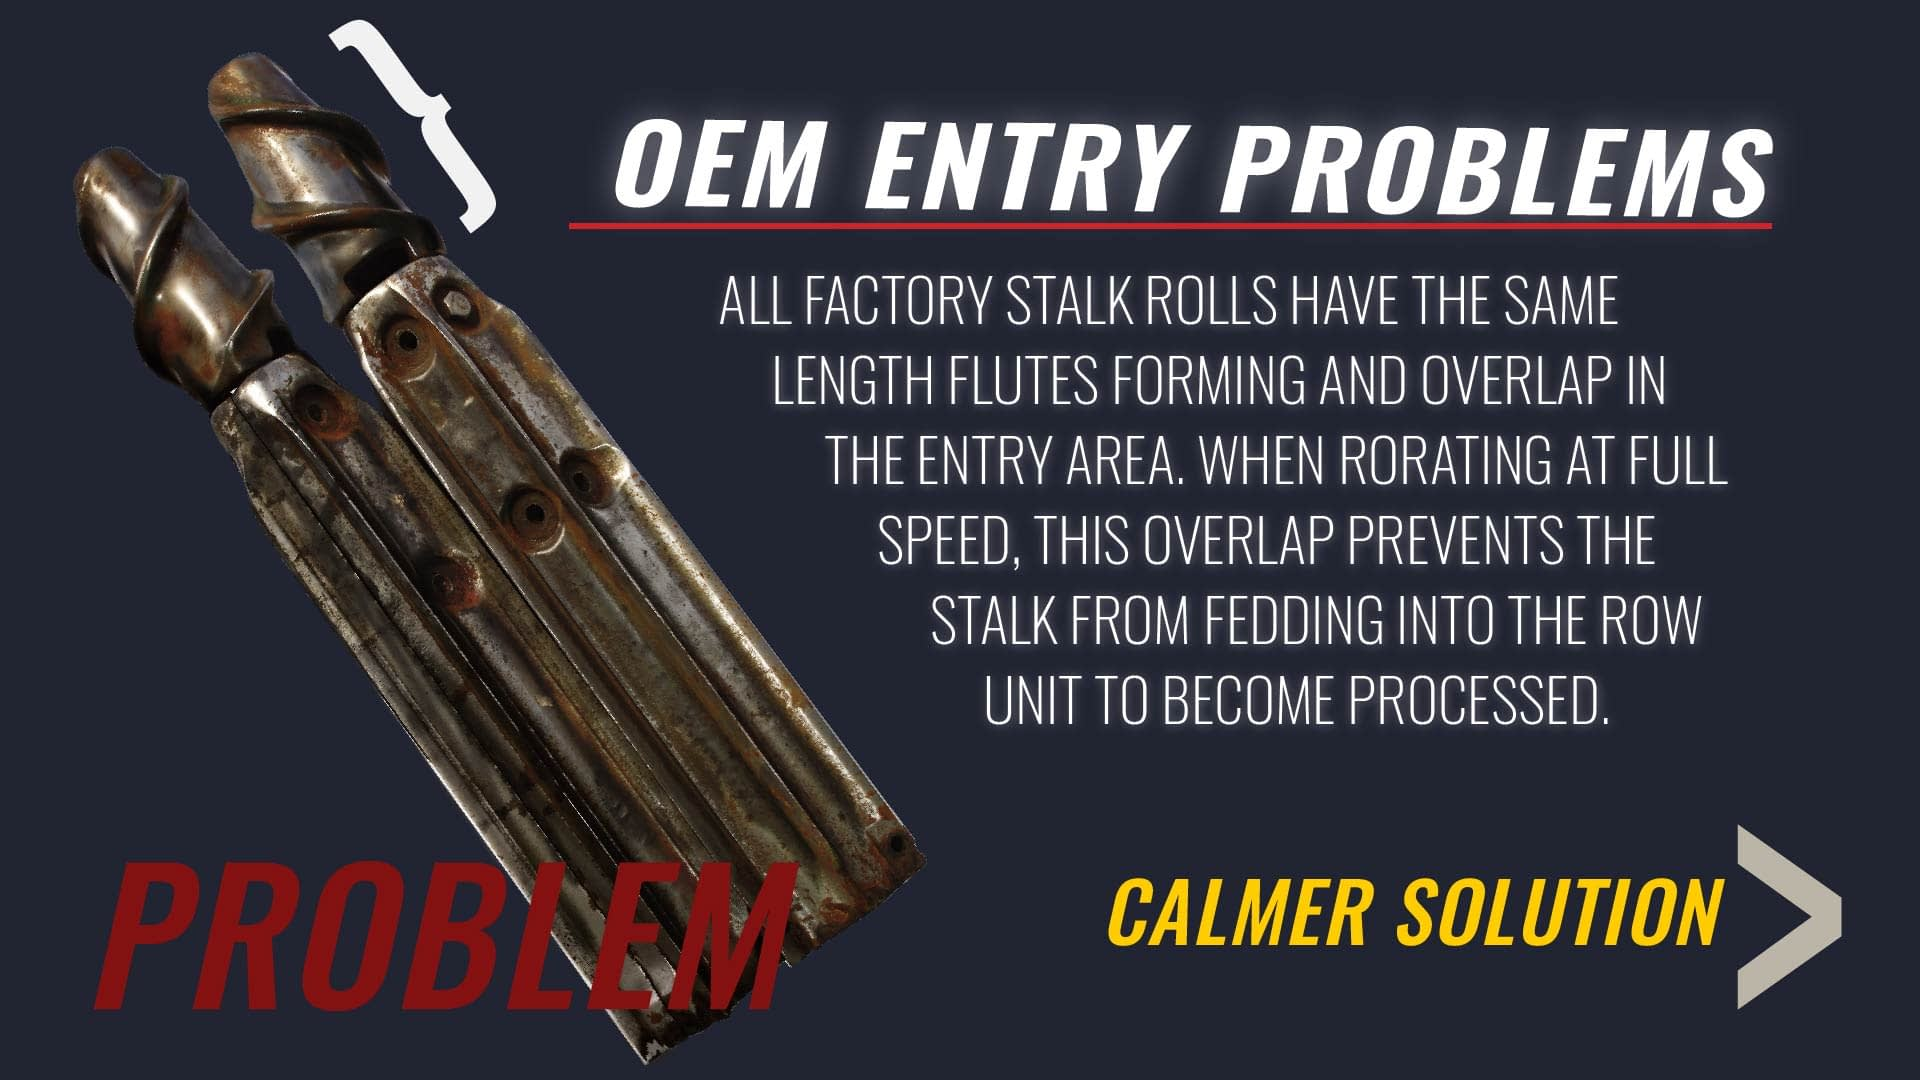 OEM entry window problems in snapper rolls